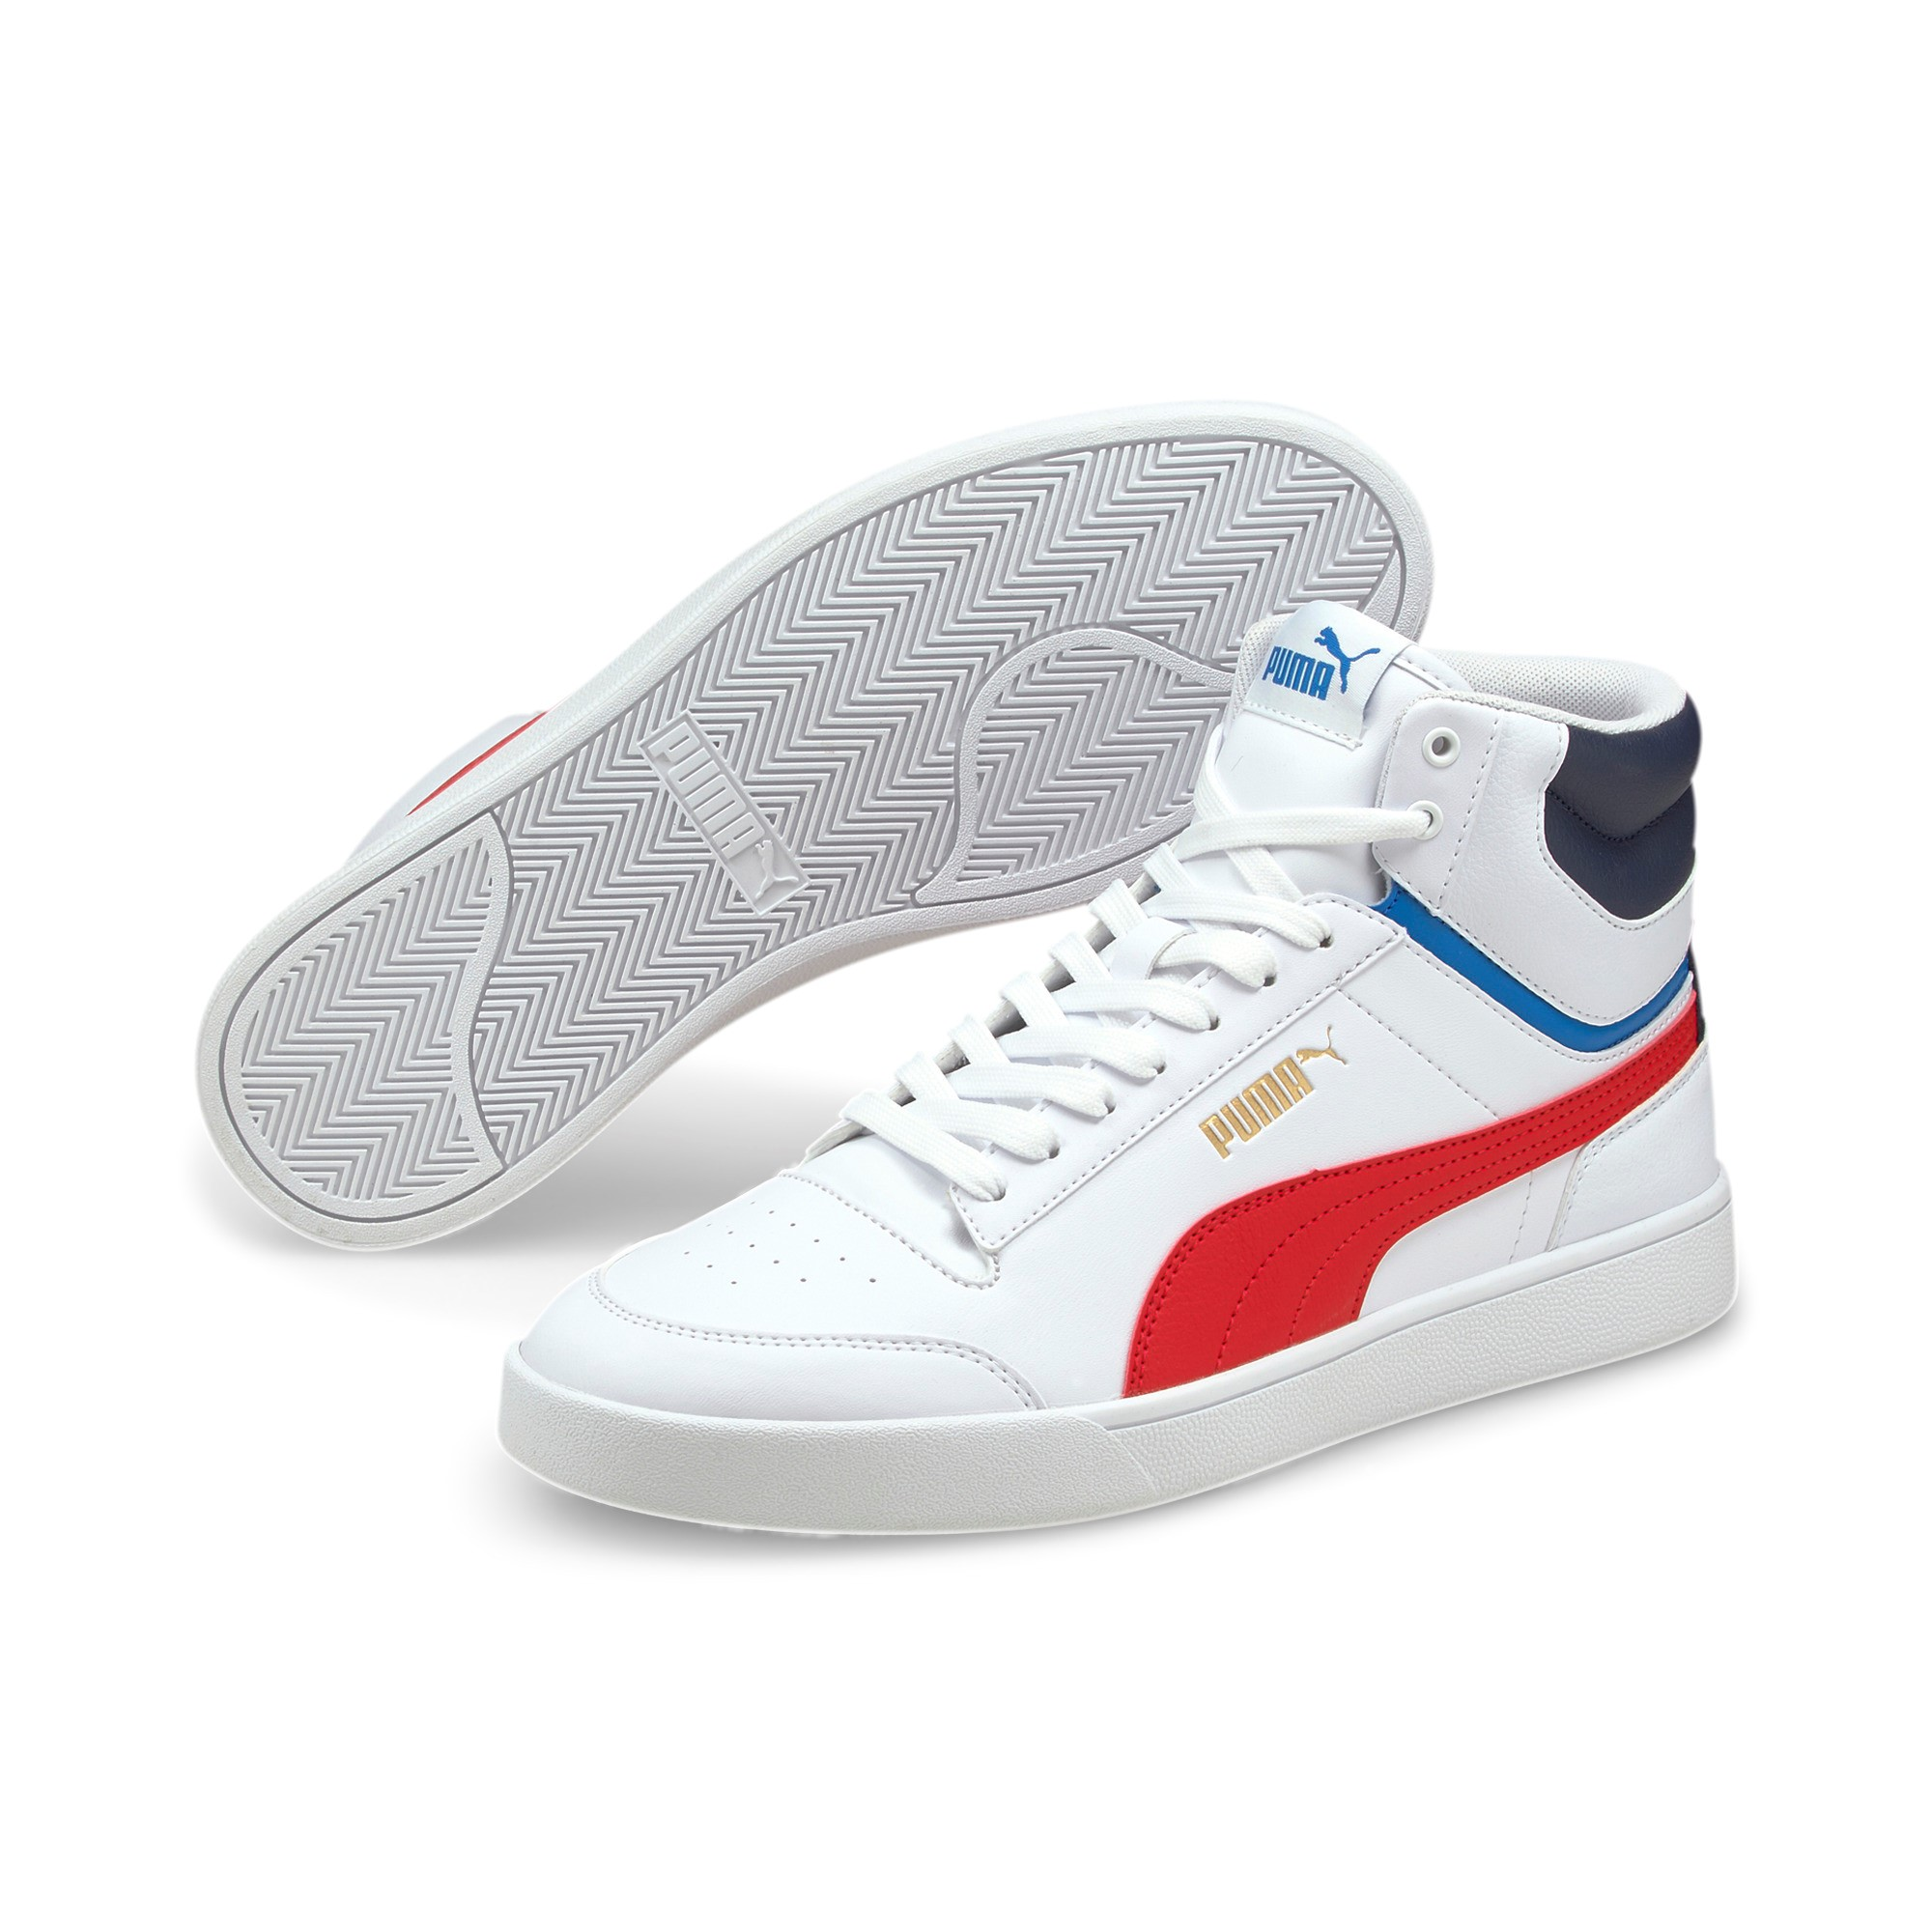 Puma mid white red 380748 03 Shuffle Mid